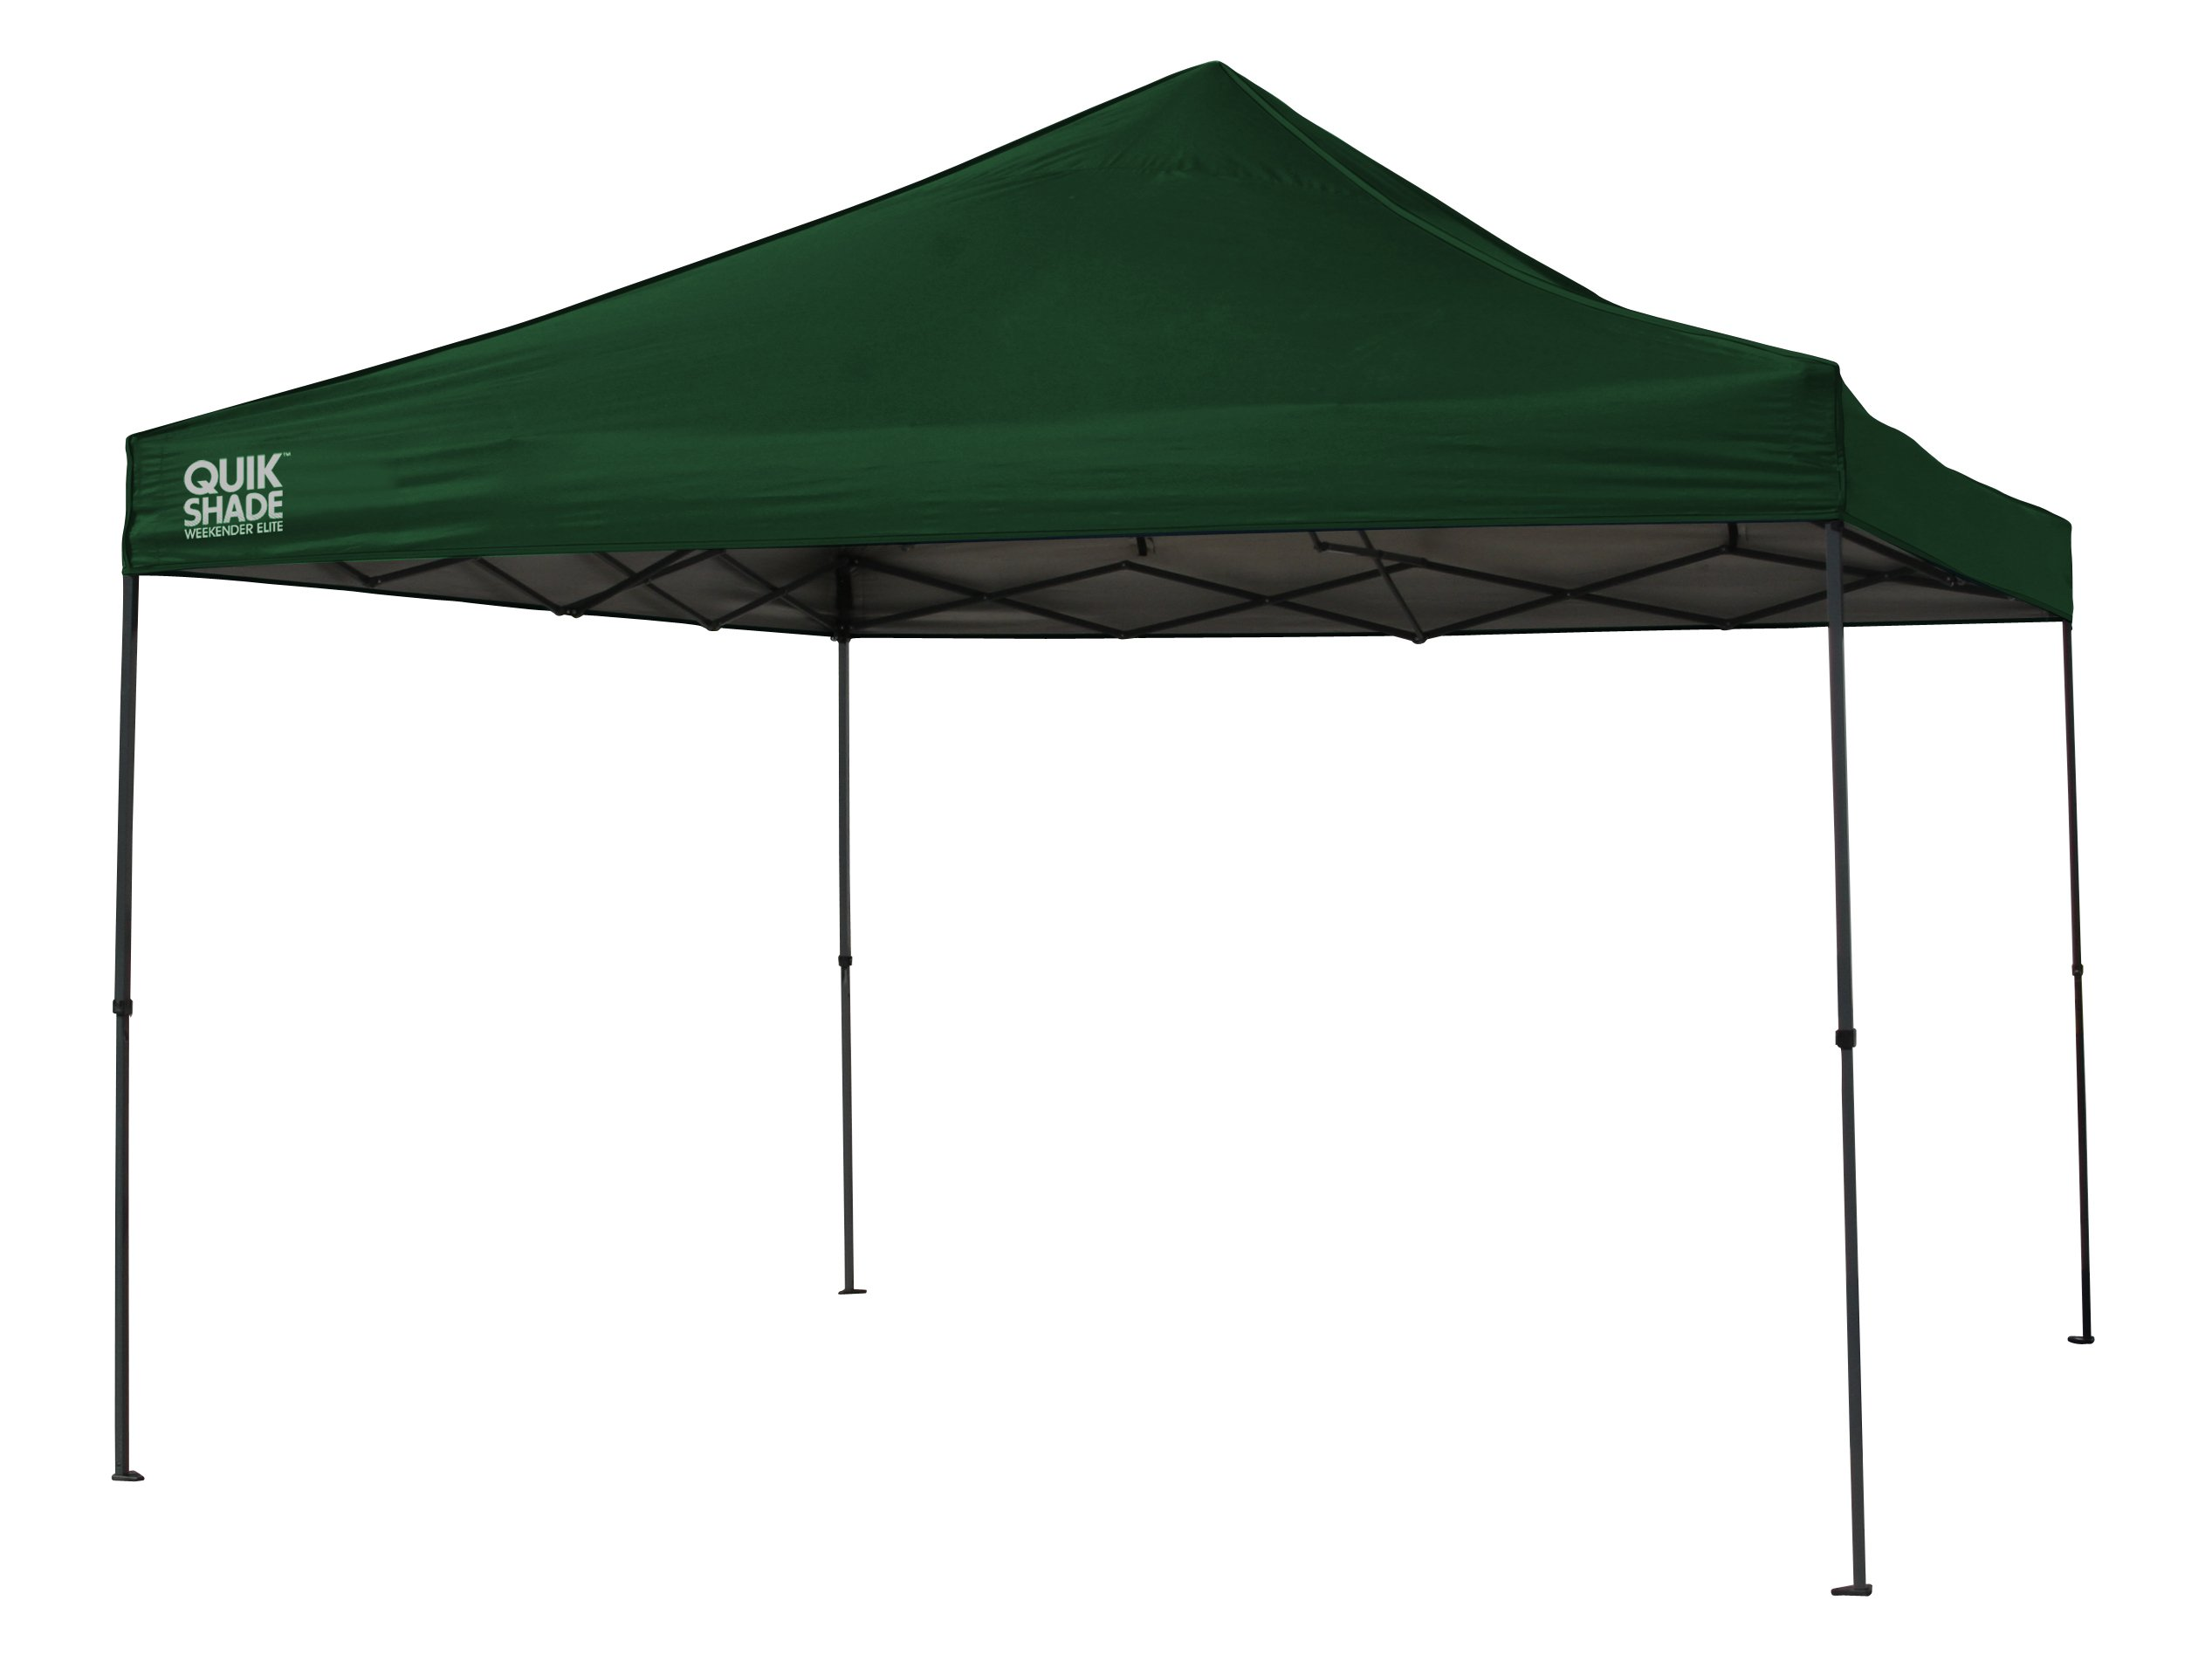 Quik Shade Weekender Elite WE144 12'x12' Instant Canopy - Green